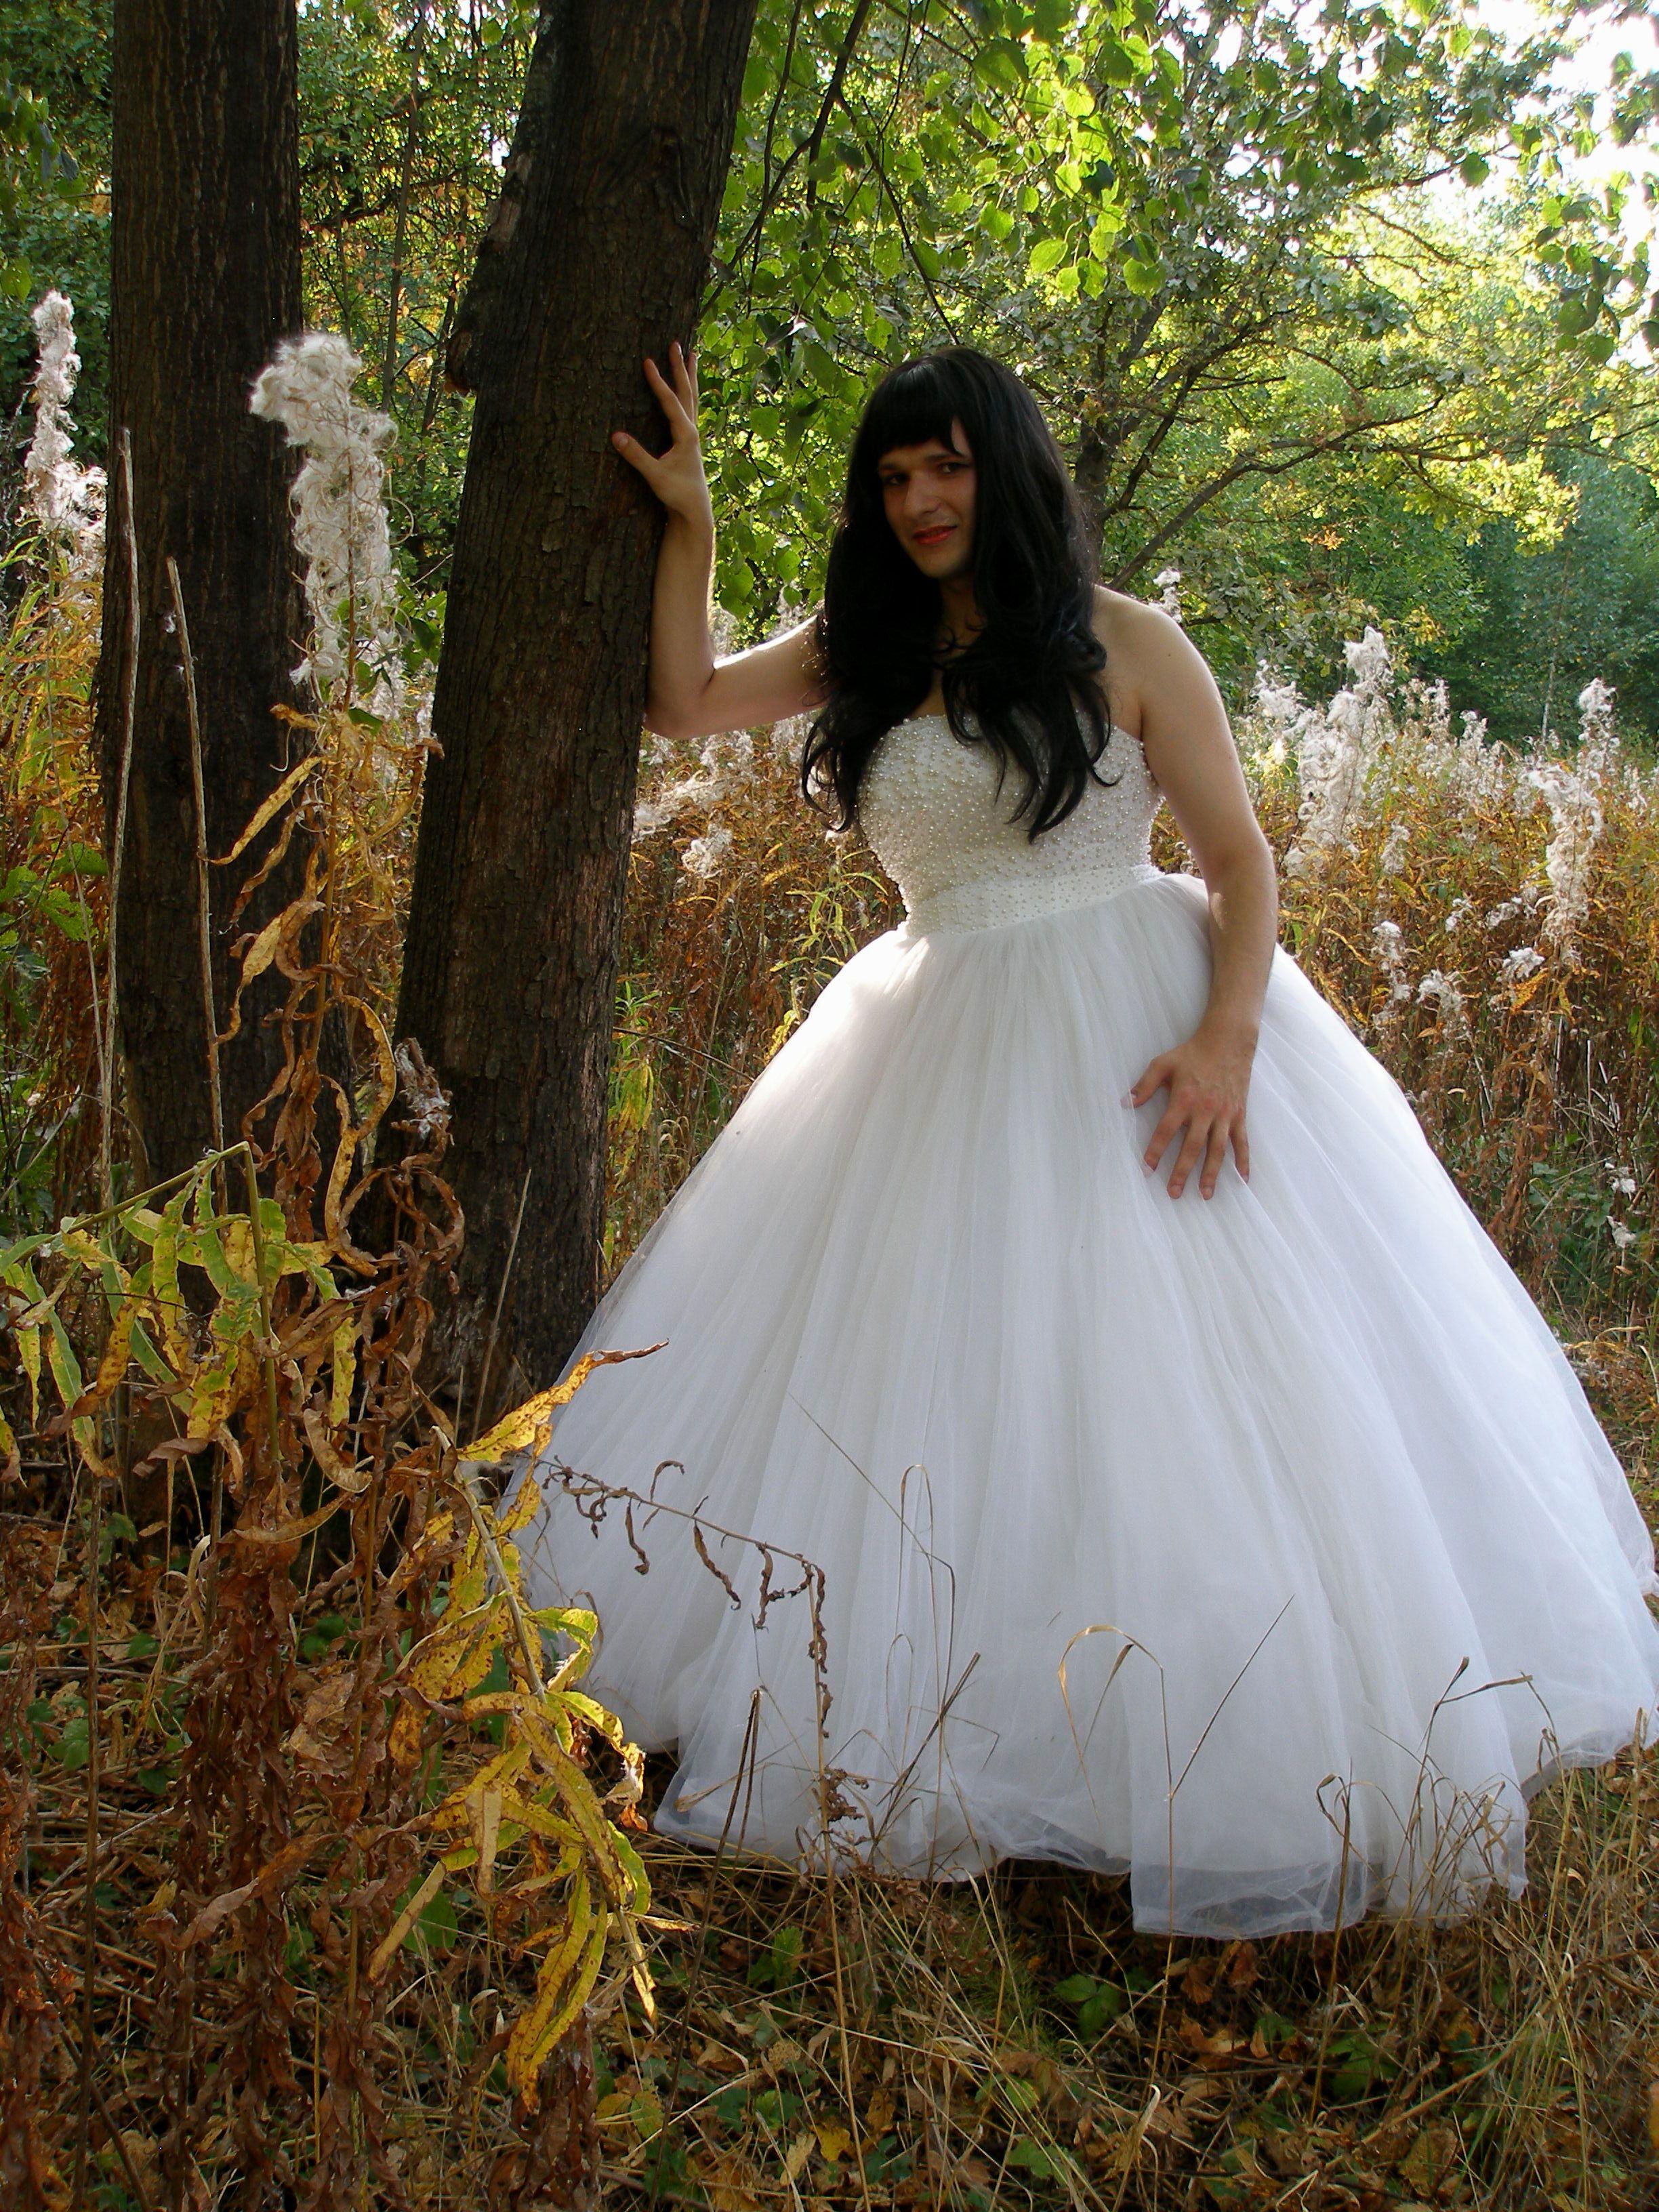 Crossdressing Wedding Gown On The Nature 1 Crossdress Bride Its